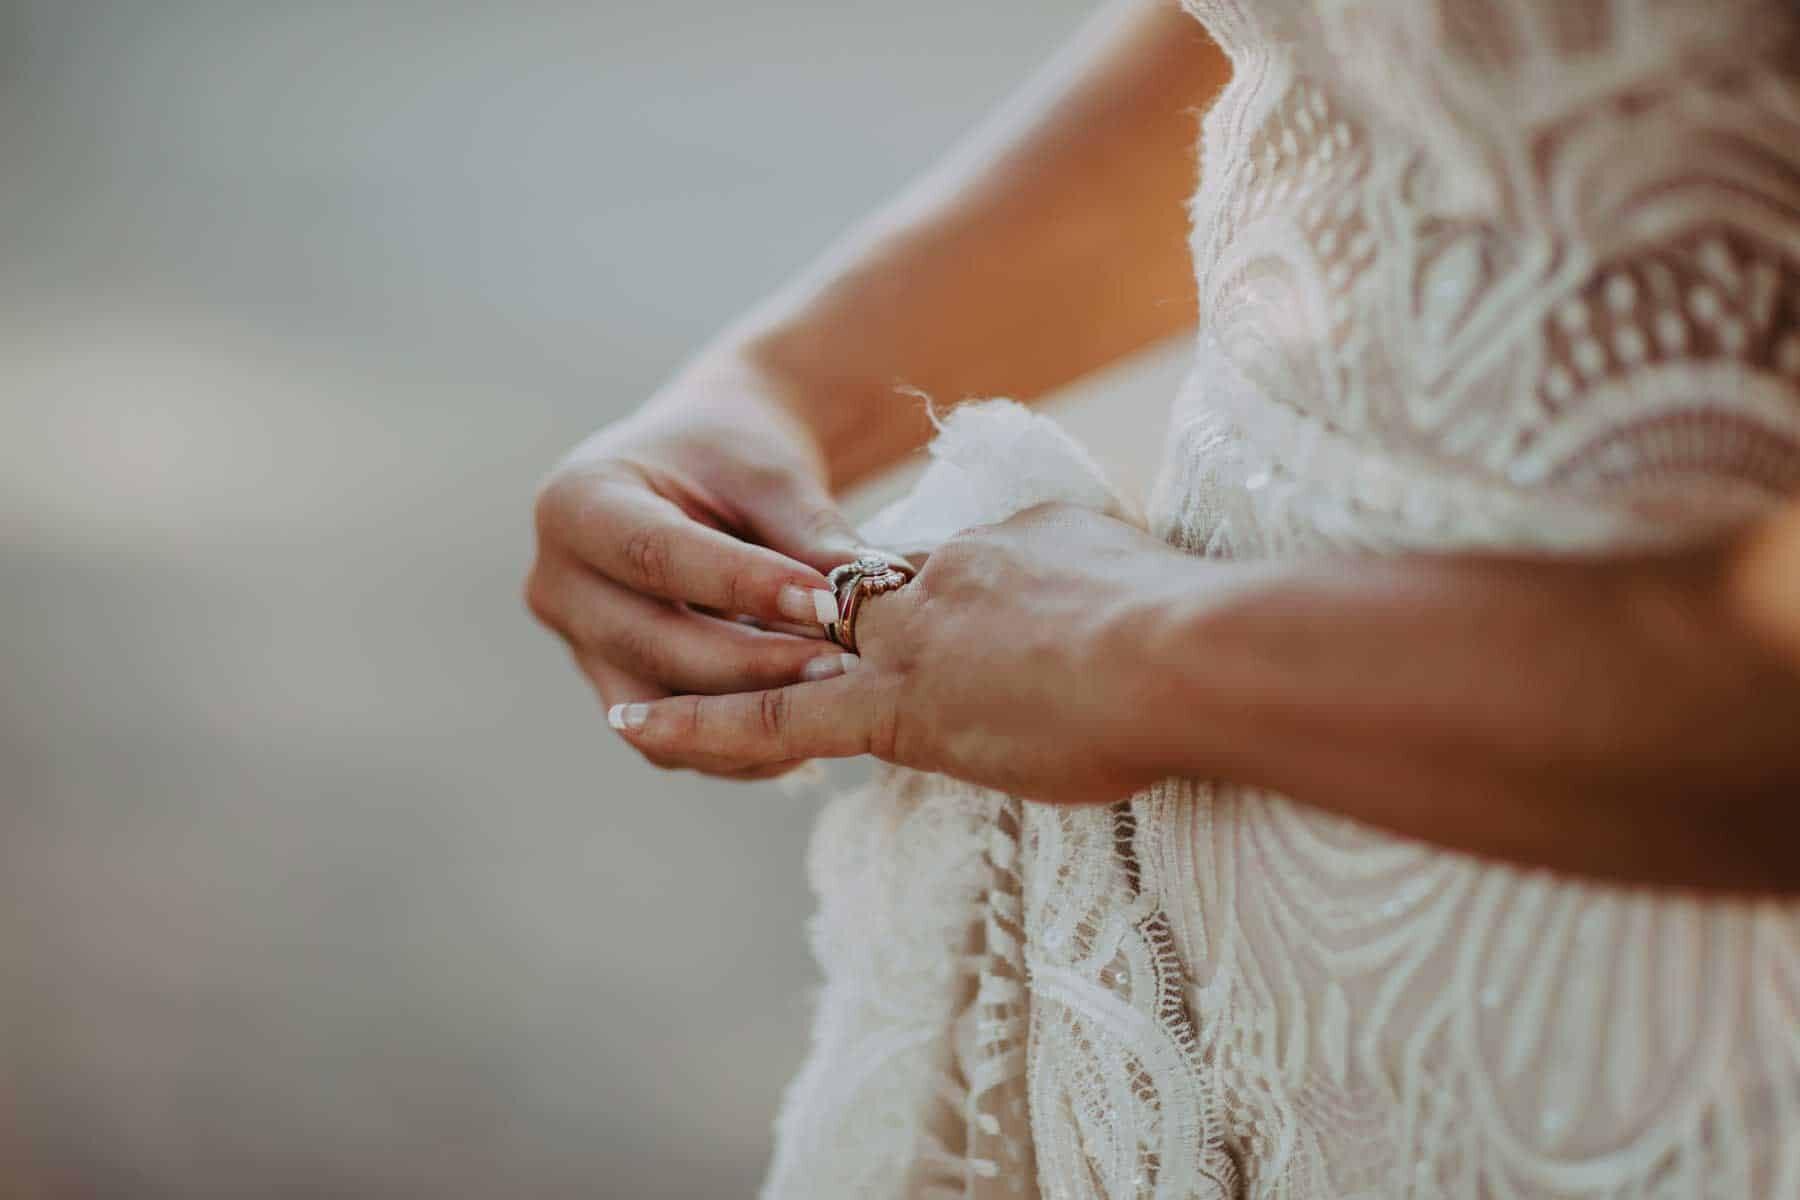 creative Perth wedding photographer James Simmons